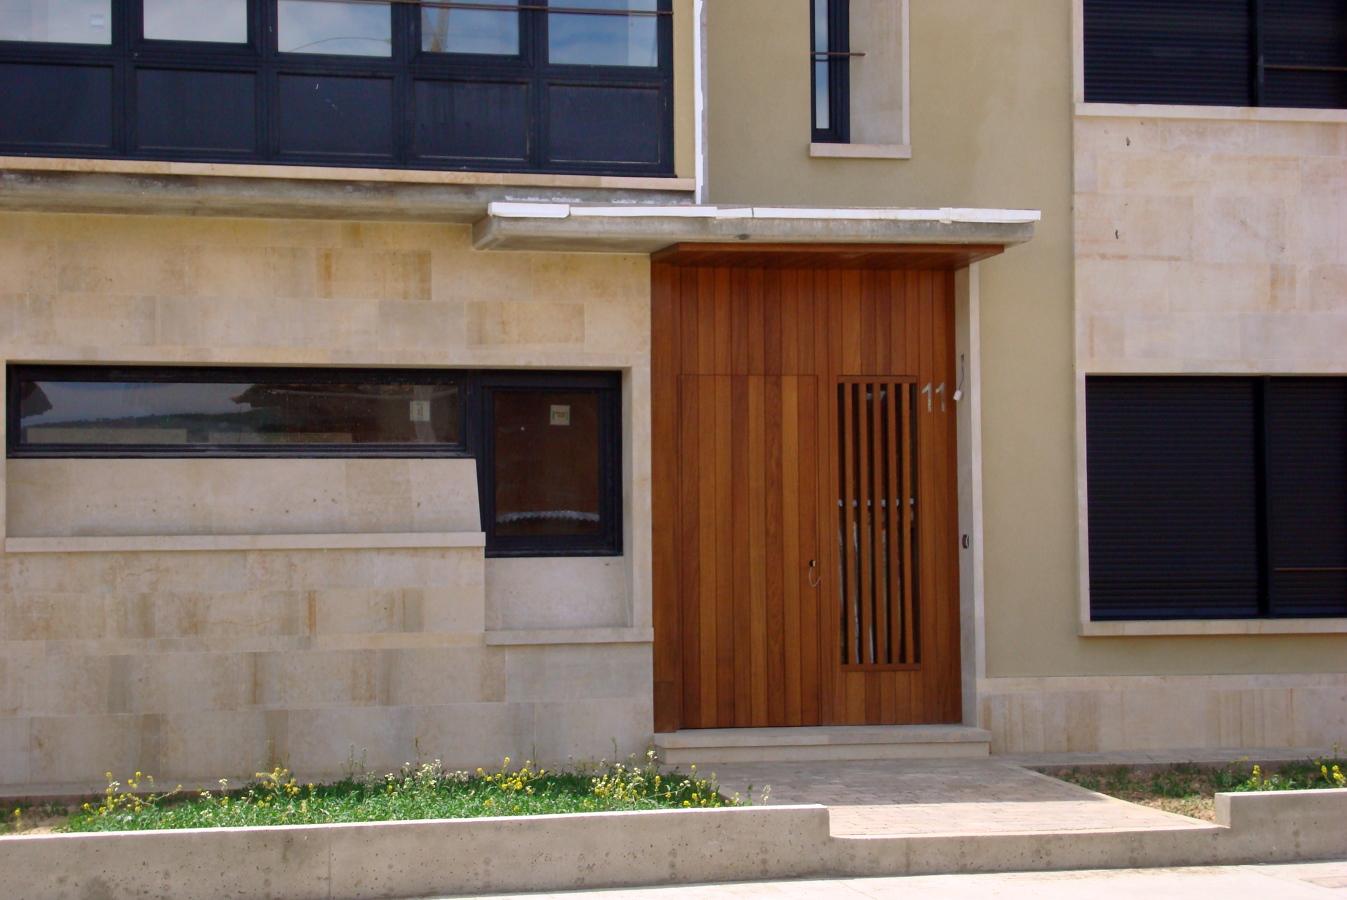 Foto puerta entrada vivienda en madera de carpinter a for Aislar puerta entrada